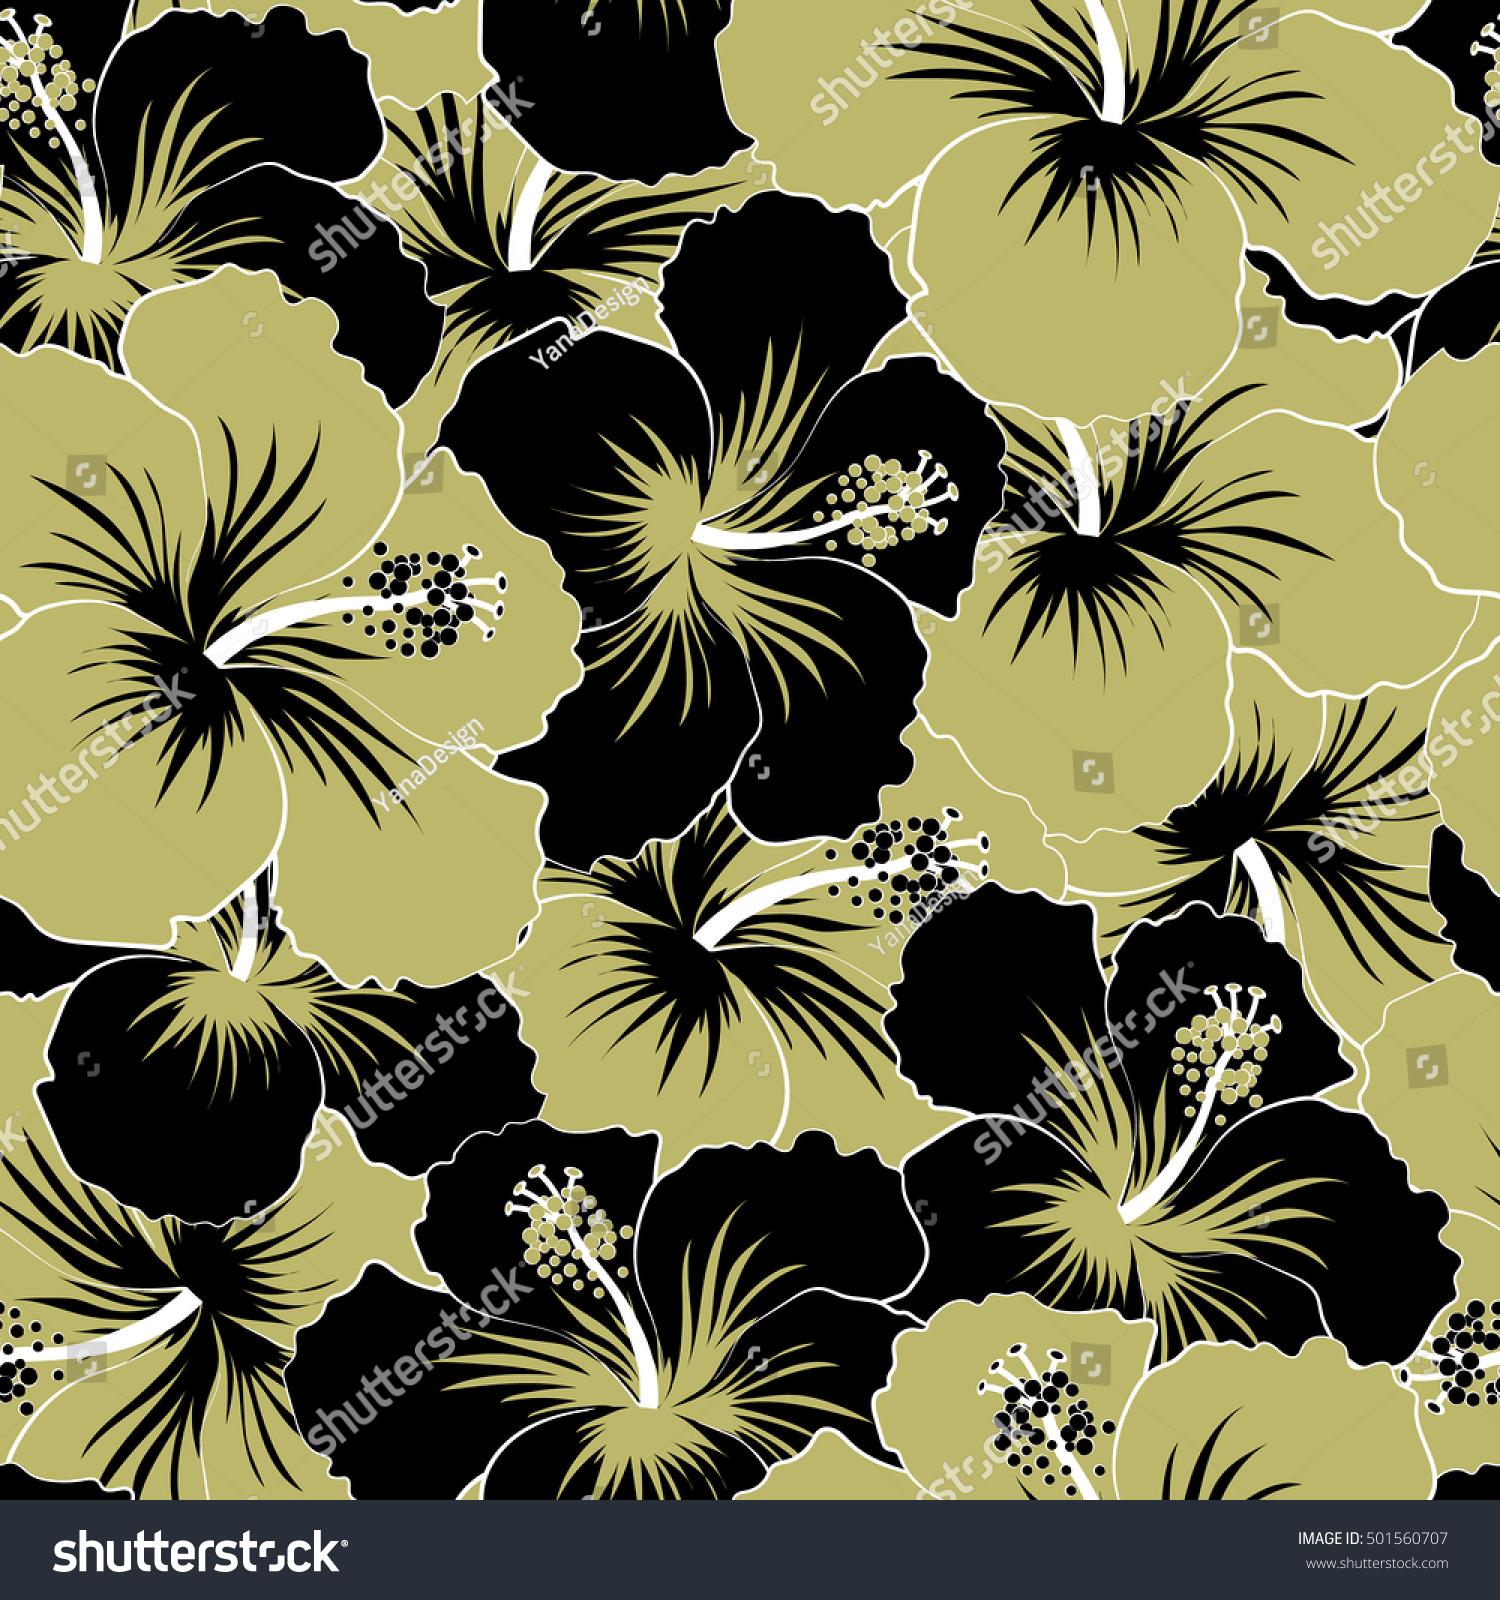 Beige black hibiscus flowers trendy vector stock vector royalty beige and black hibiscus flowers in a trendy vector style hawaiian tropical natural floral seamless izmirmasajfo